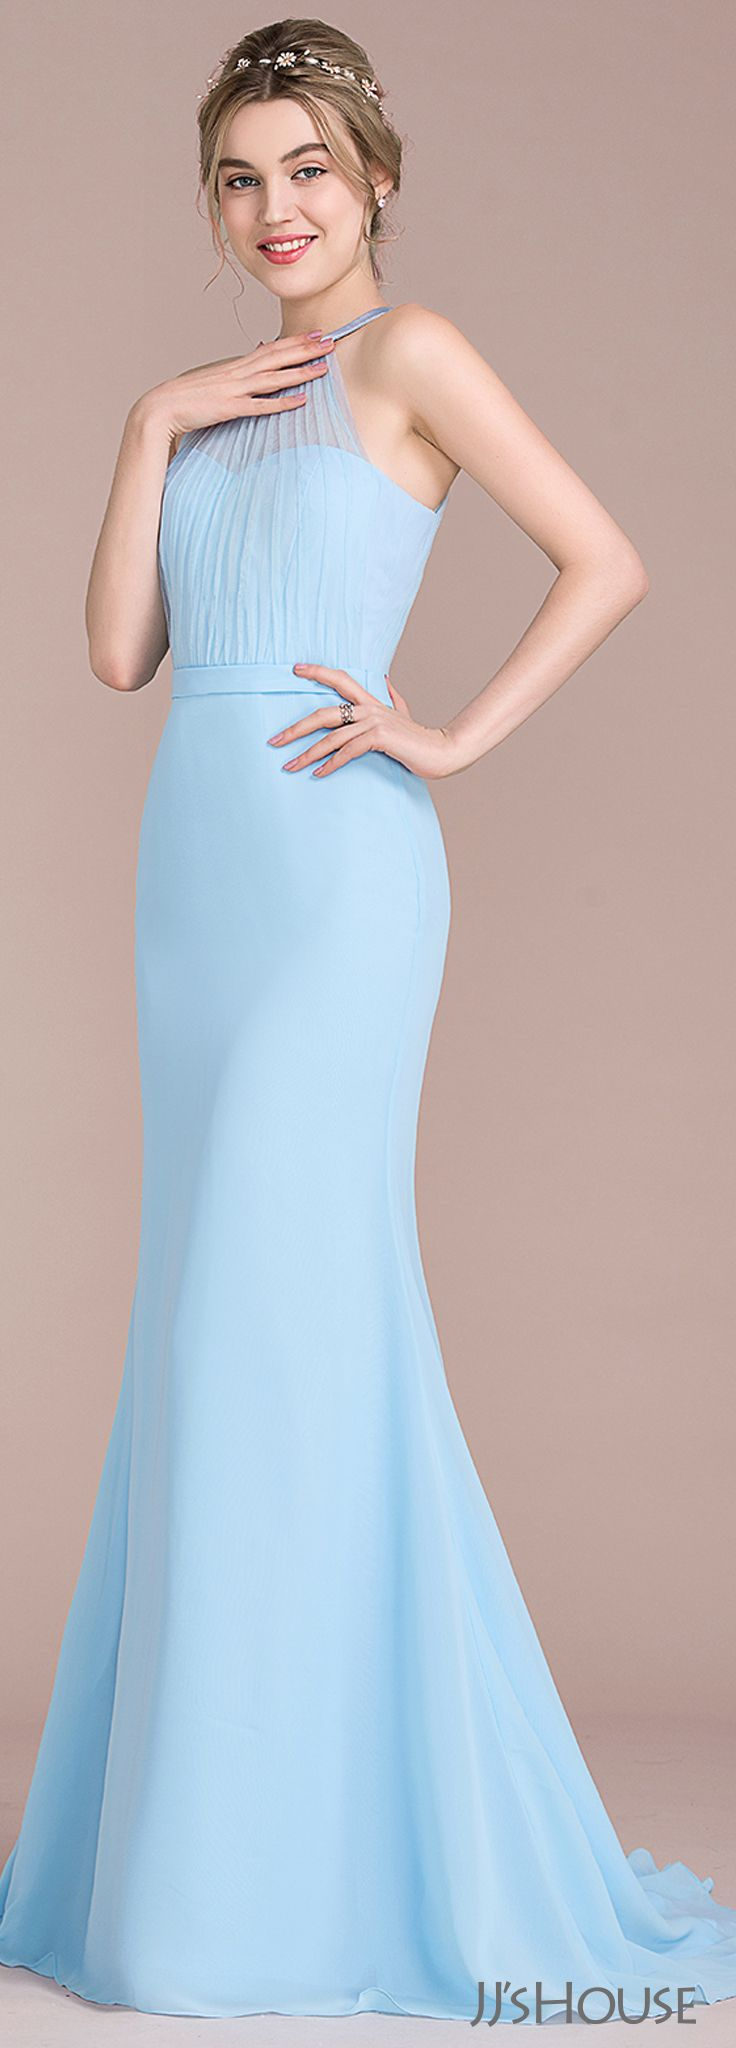 492 best jjshouse bridesmaid dresses images on pinterest jjshouse bridesmaid ombrellifo Image collections